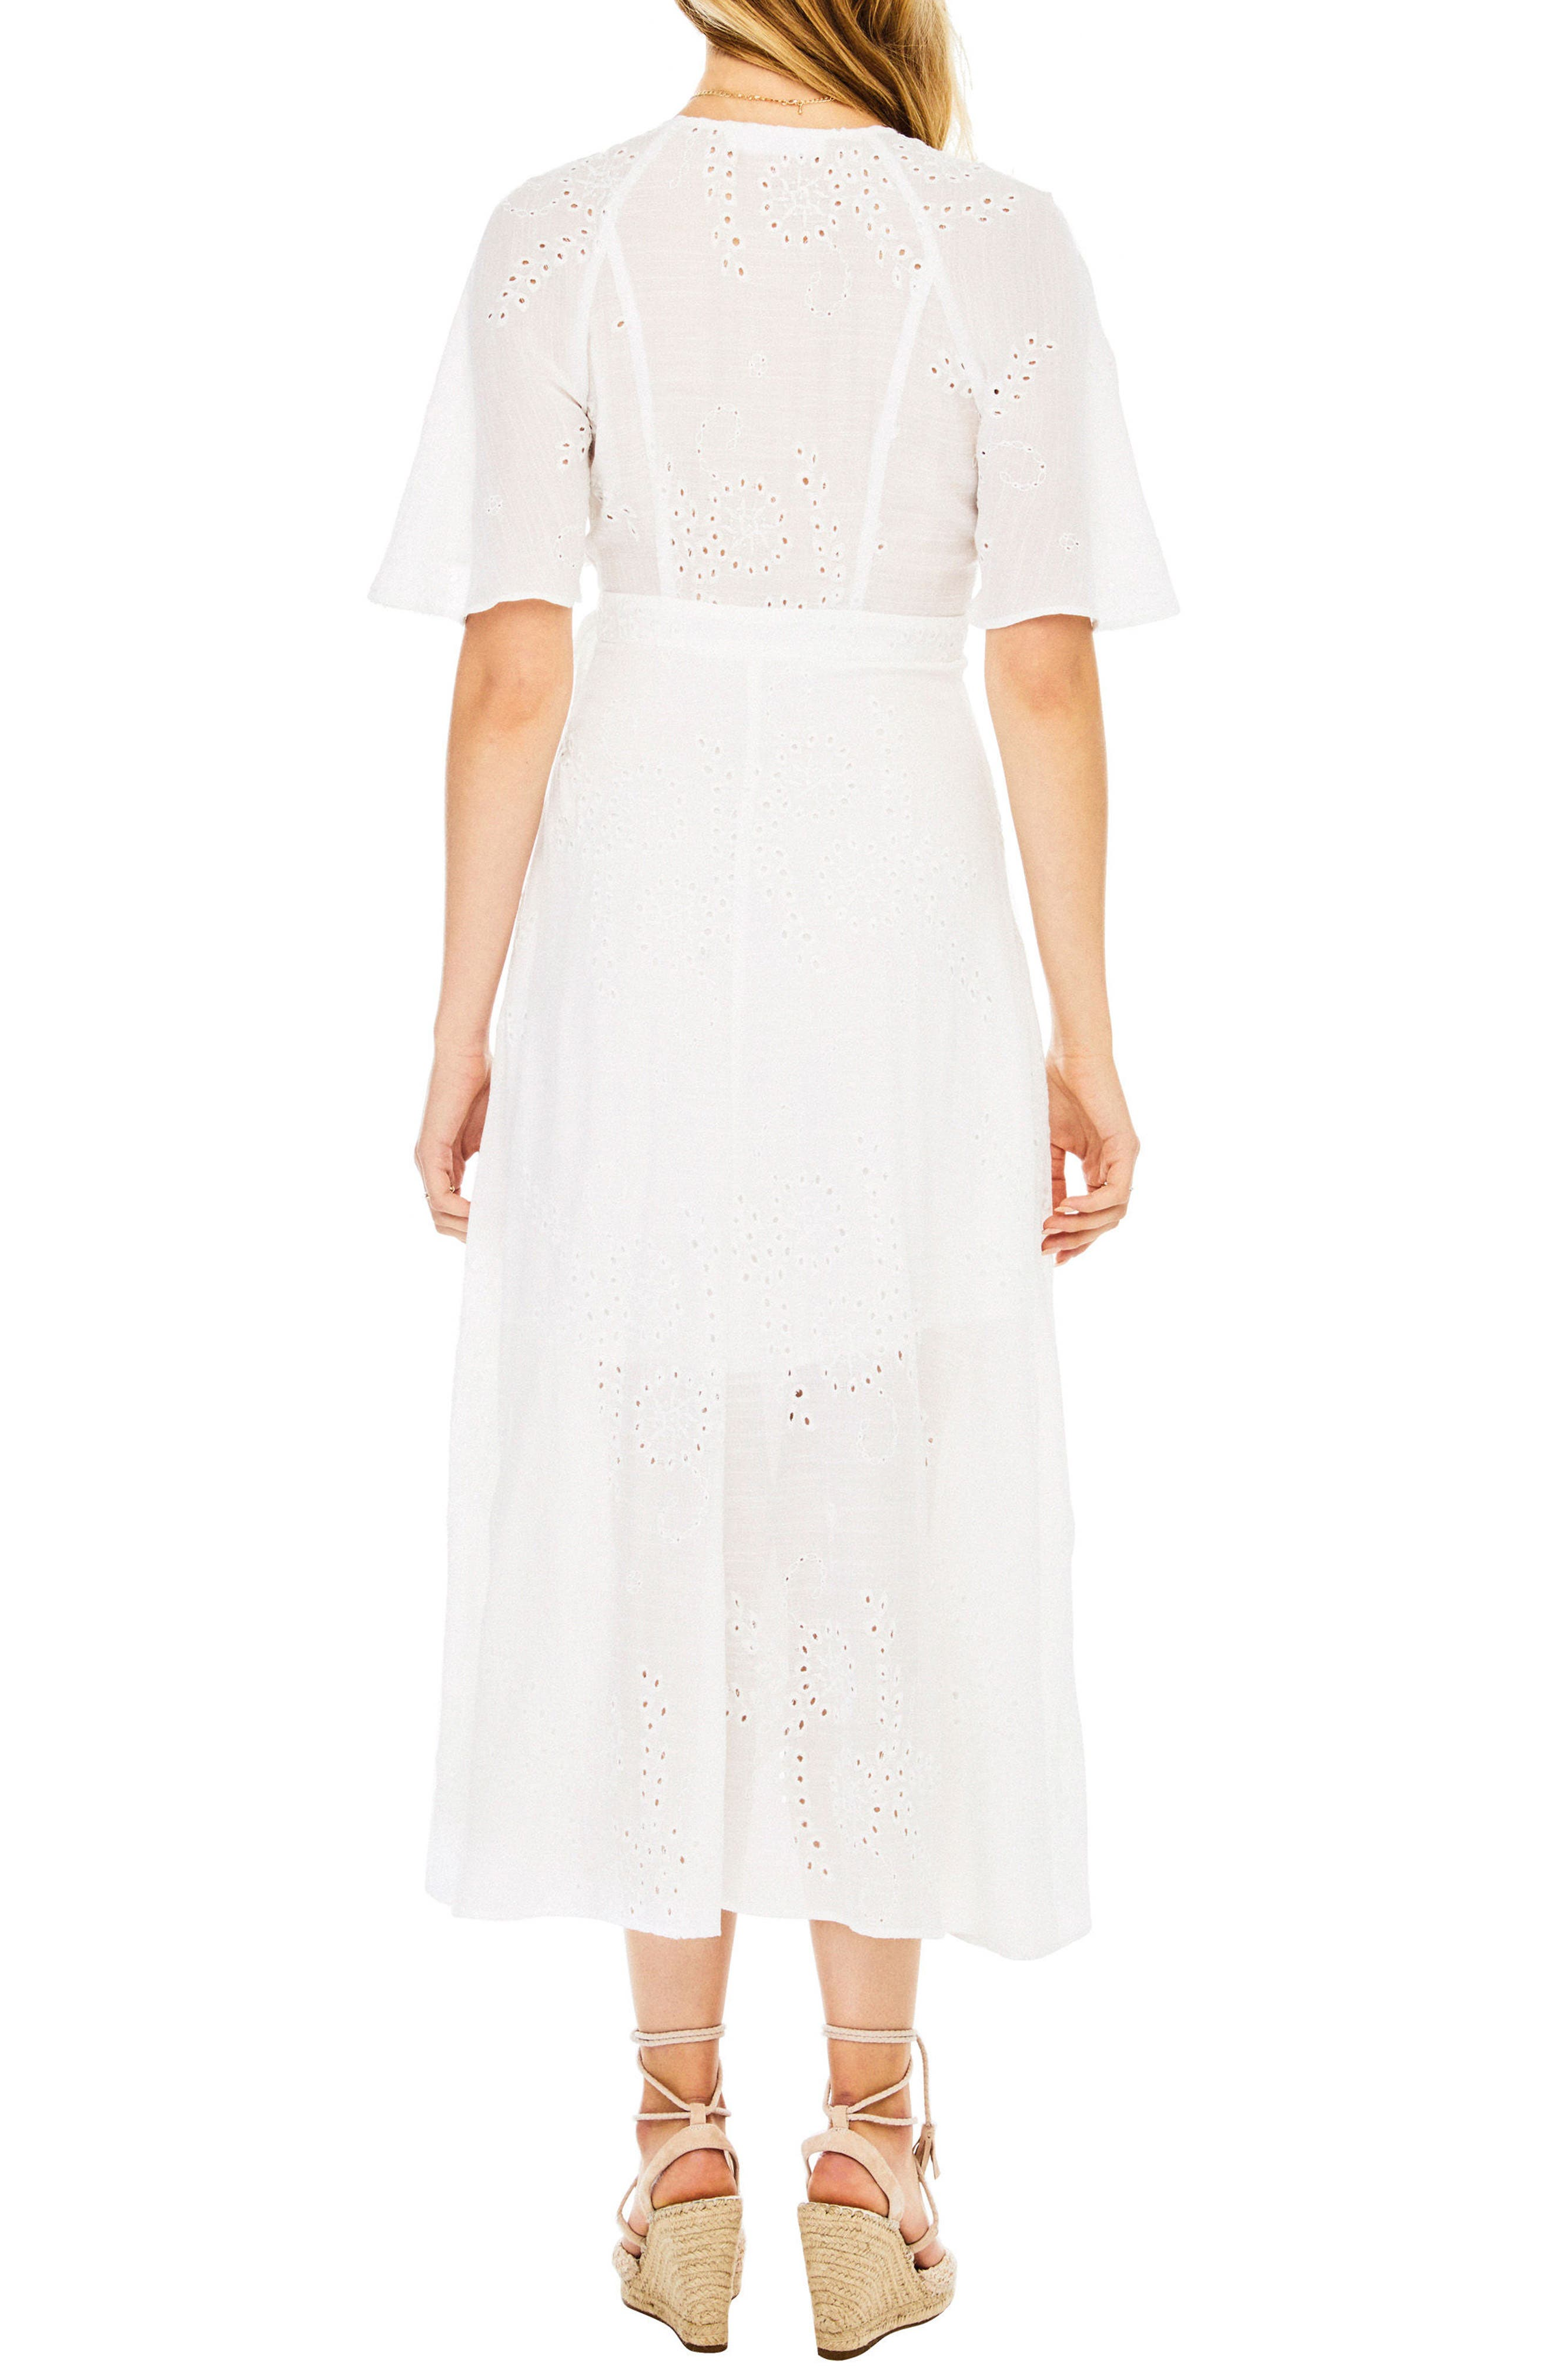 Gretchen Eyelet Wrap Dress,                             Alternate thumbnail 2, color,                             100